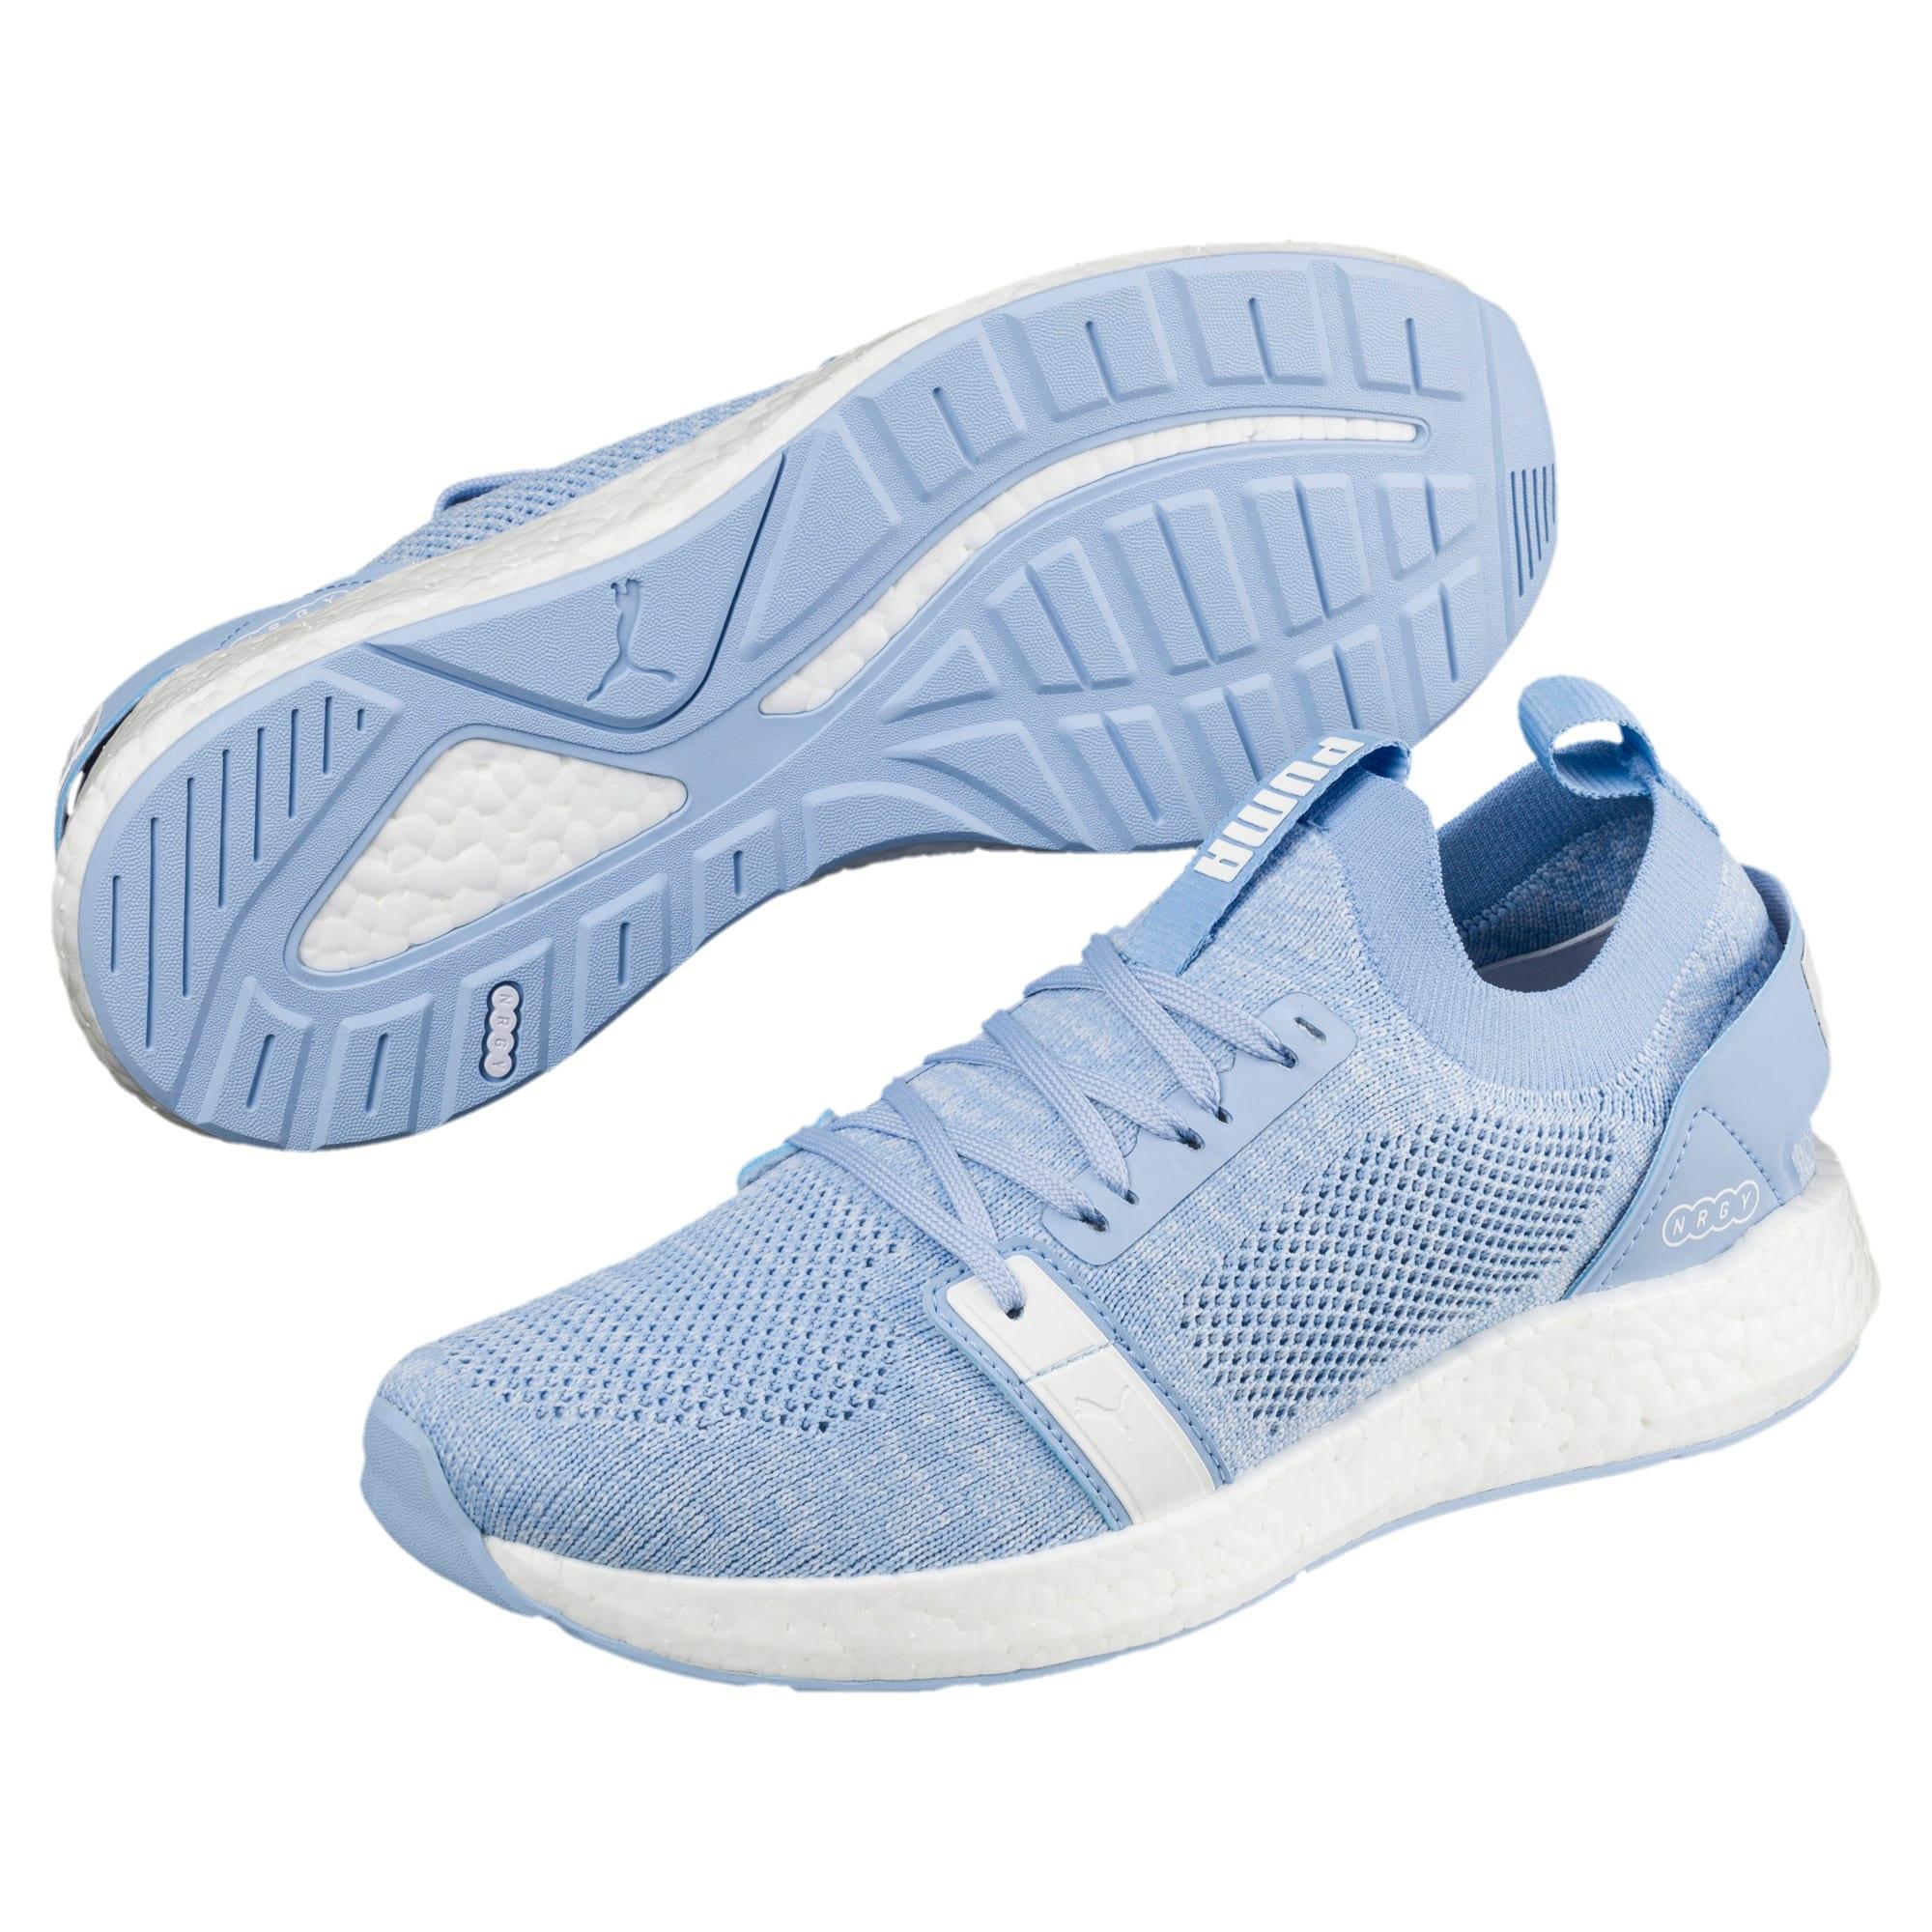 Thumbnail 2 of NRGY Neko Engineer Knit Women's Running Shoes, CERULEAN-Puma White, medium